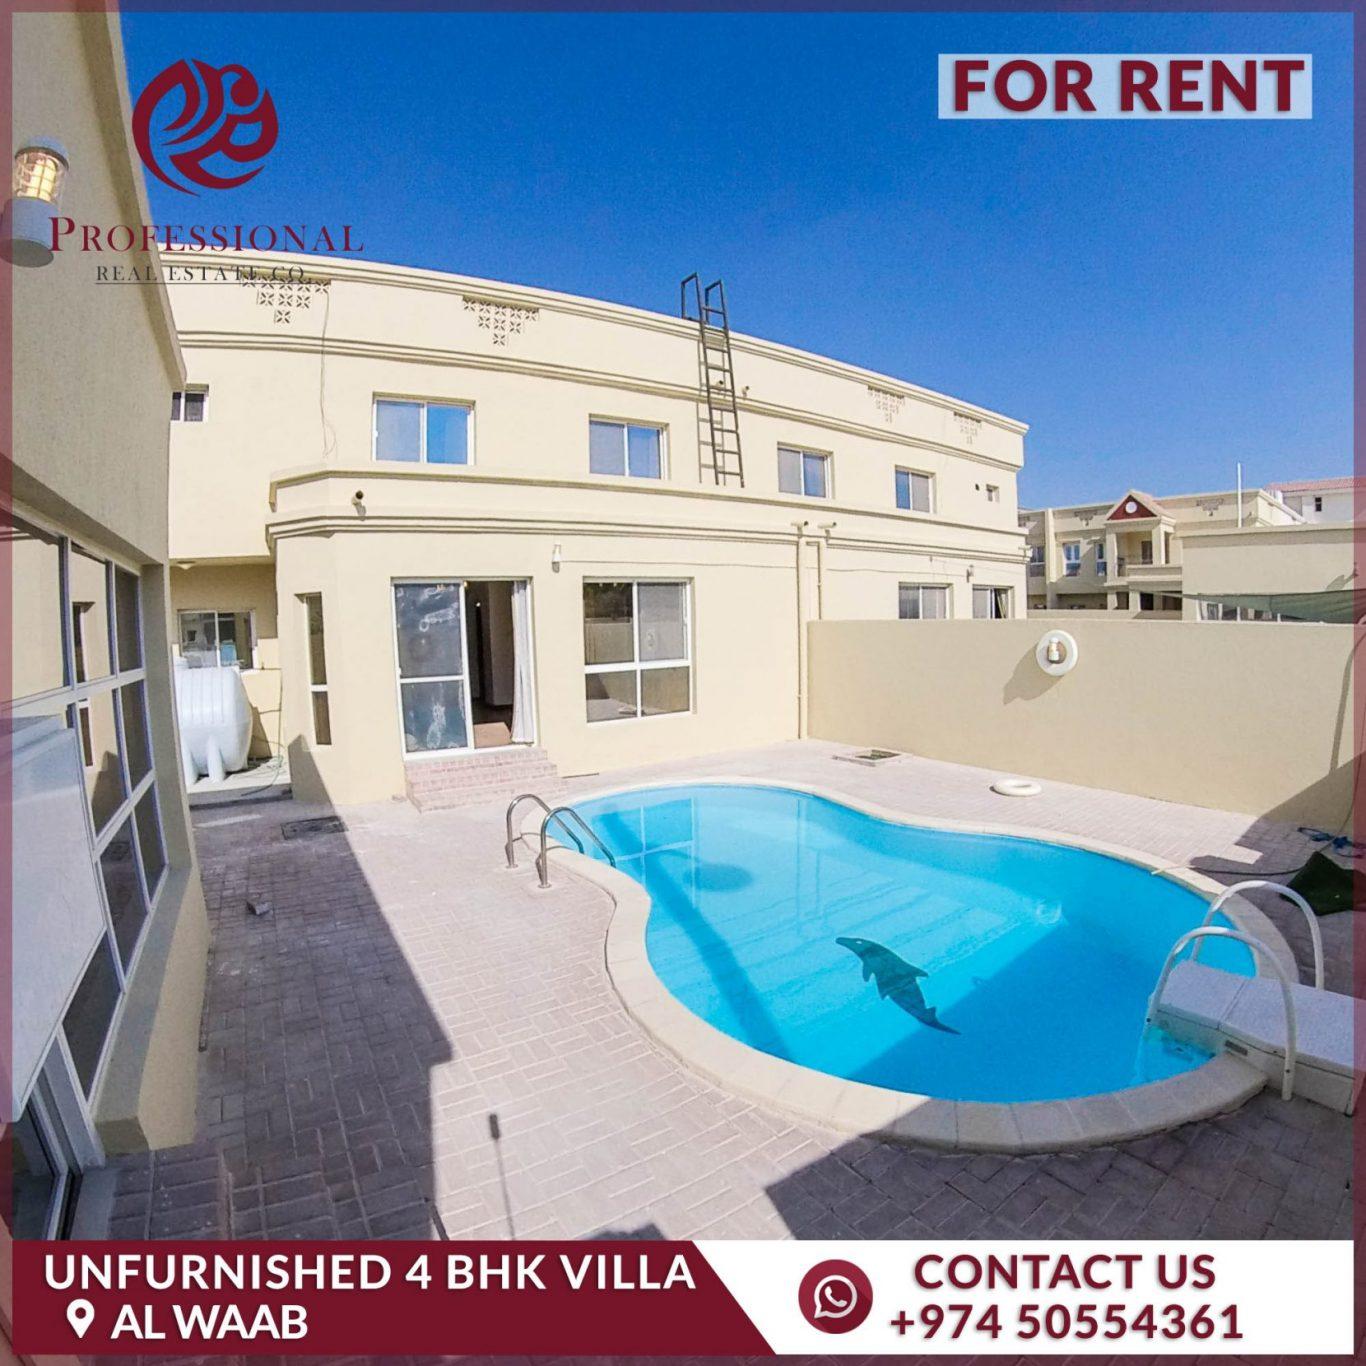 Unfurnished, 4 BHK Compound Villa in Al Waab